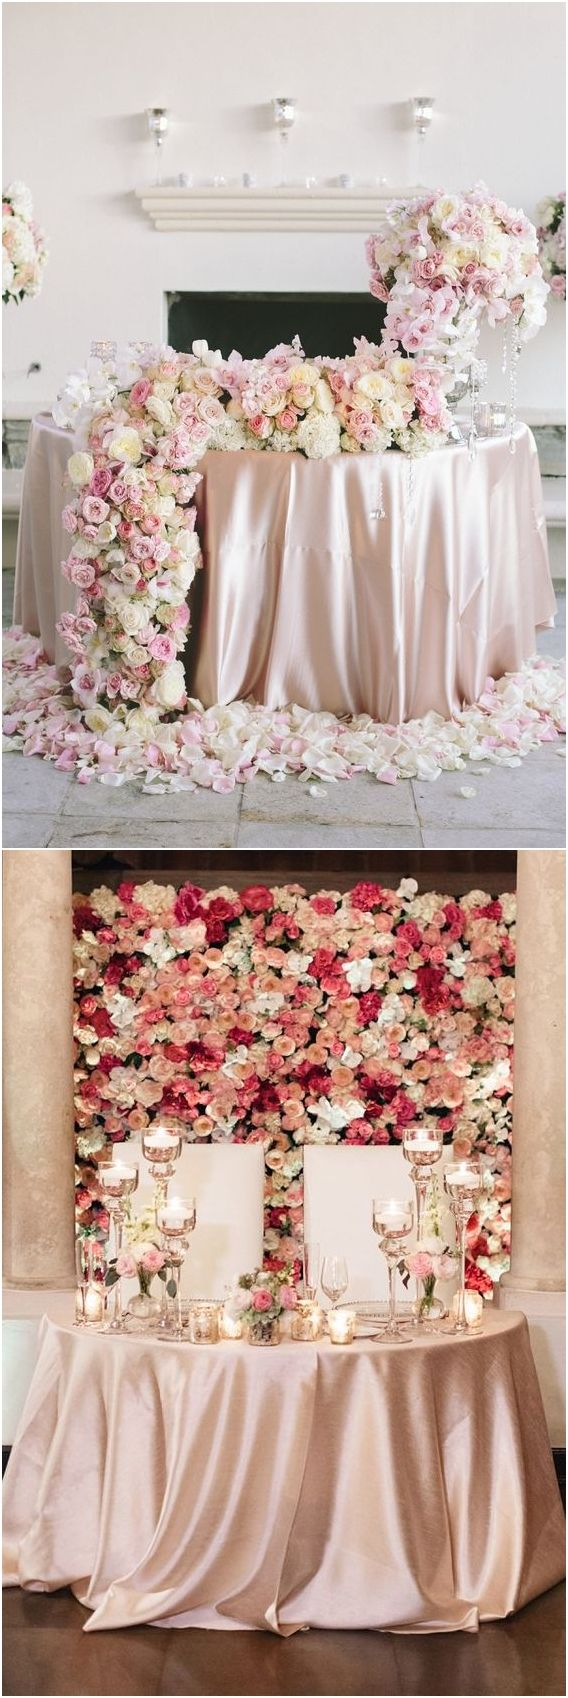 Luxury wedding decoration ideas  Top  Luxury Sweetheart Table Decor Ideas  Wedding Reception